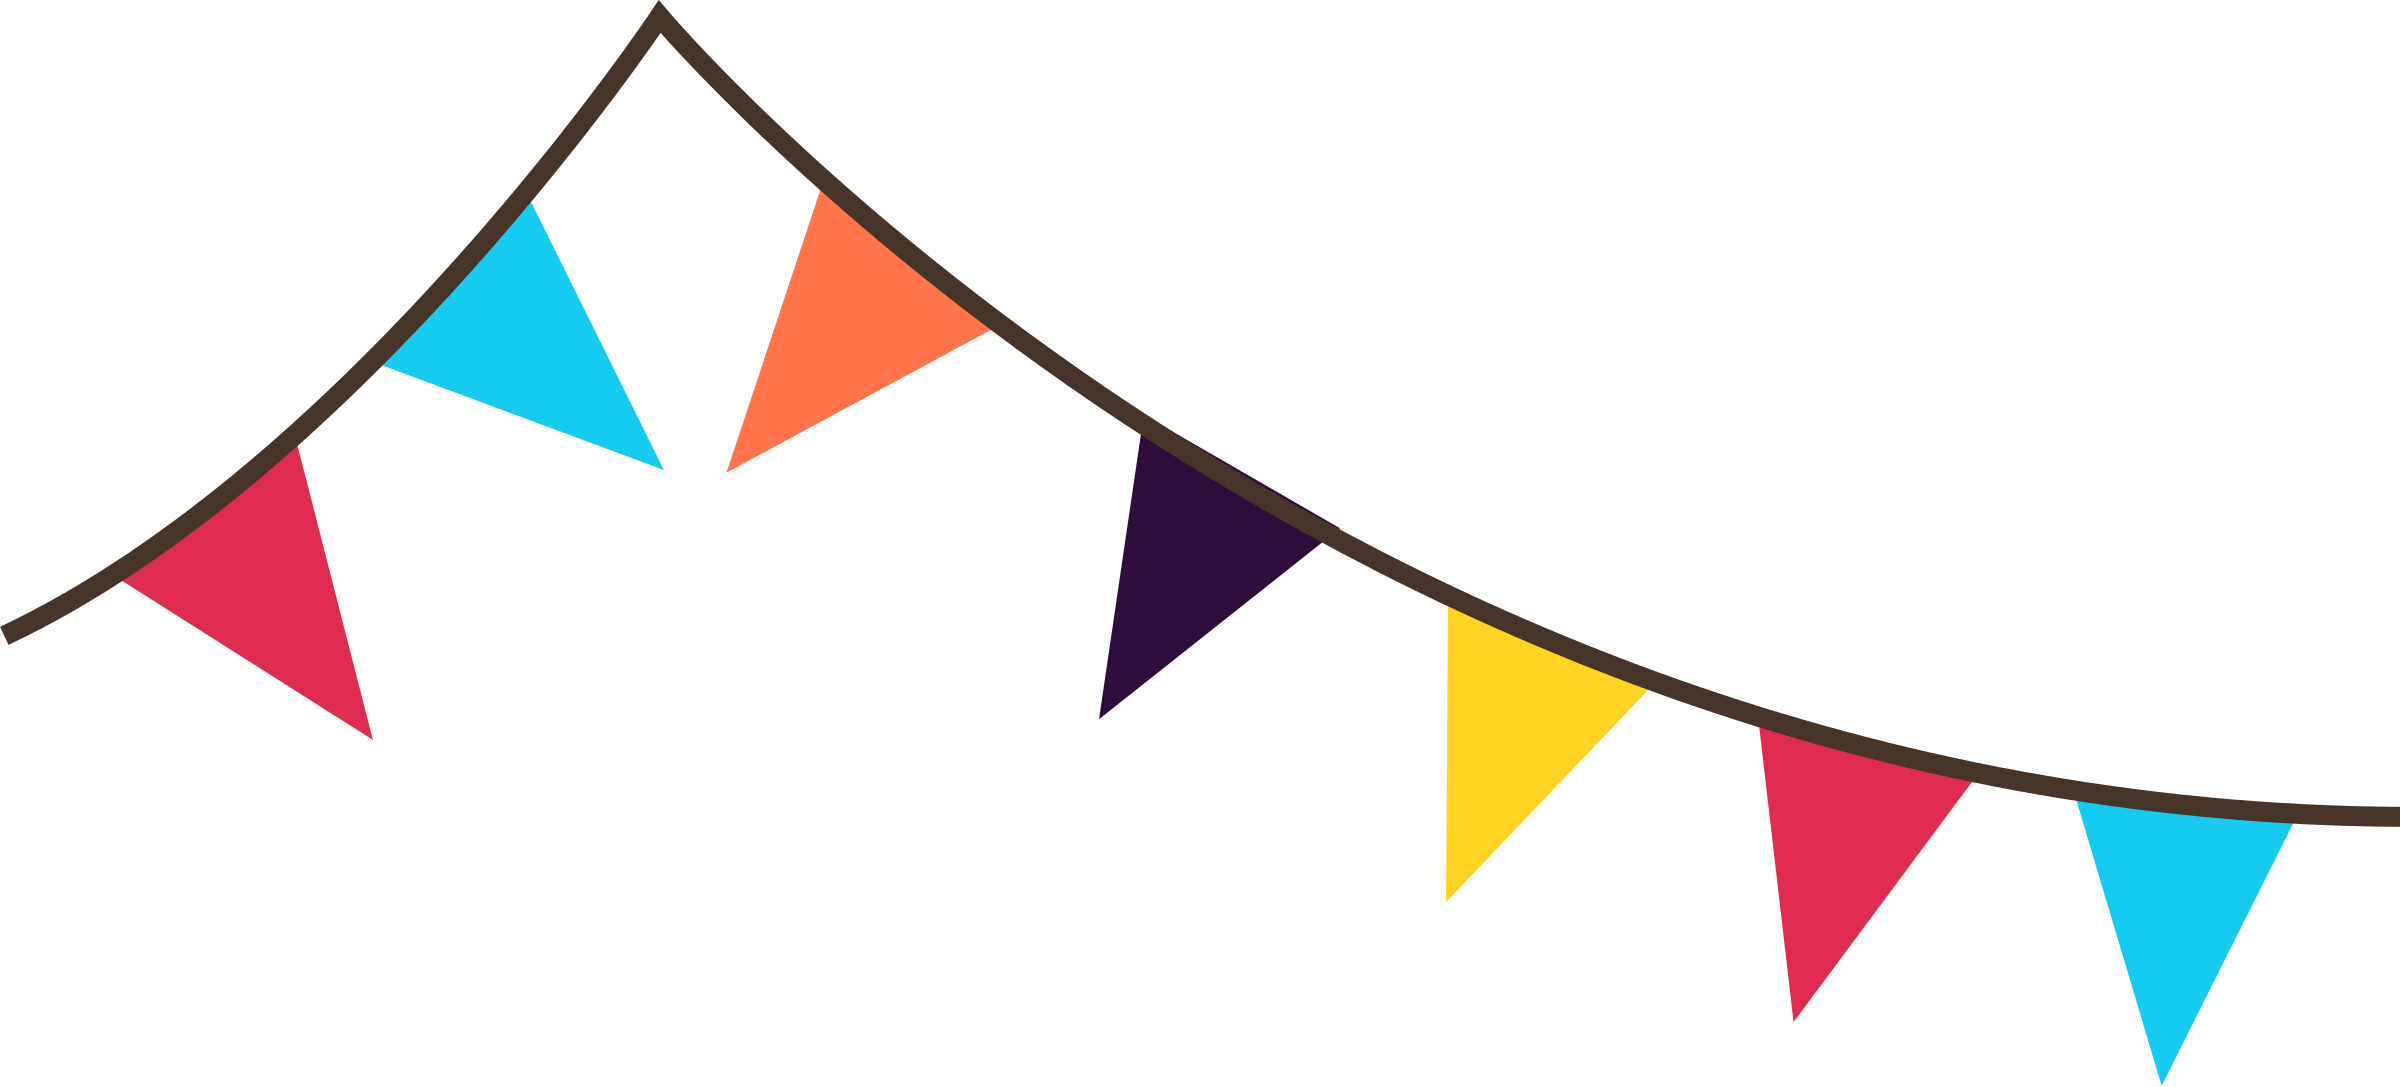 Banner clipart: Banner clip a